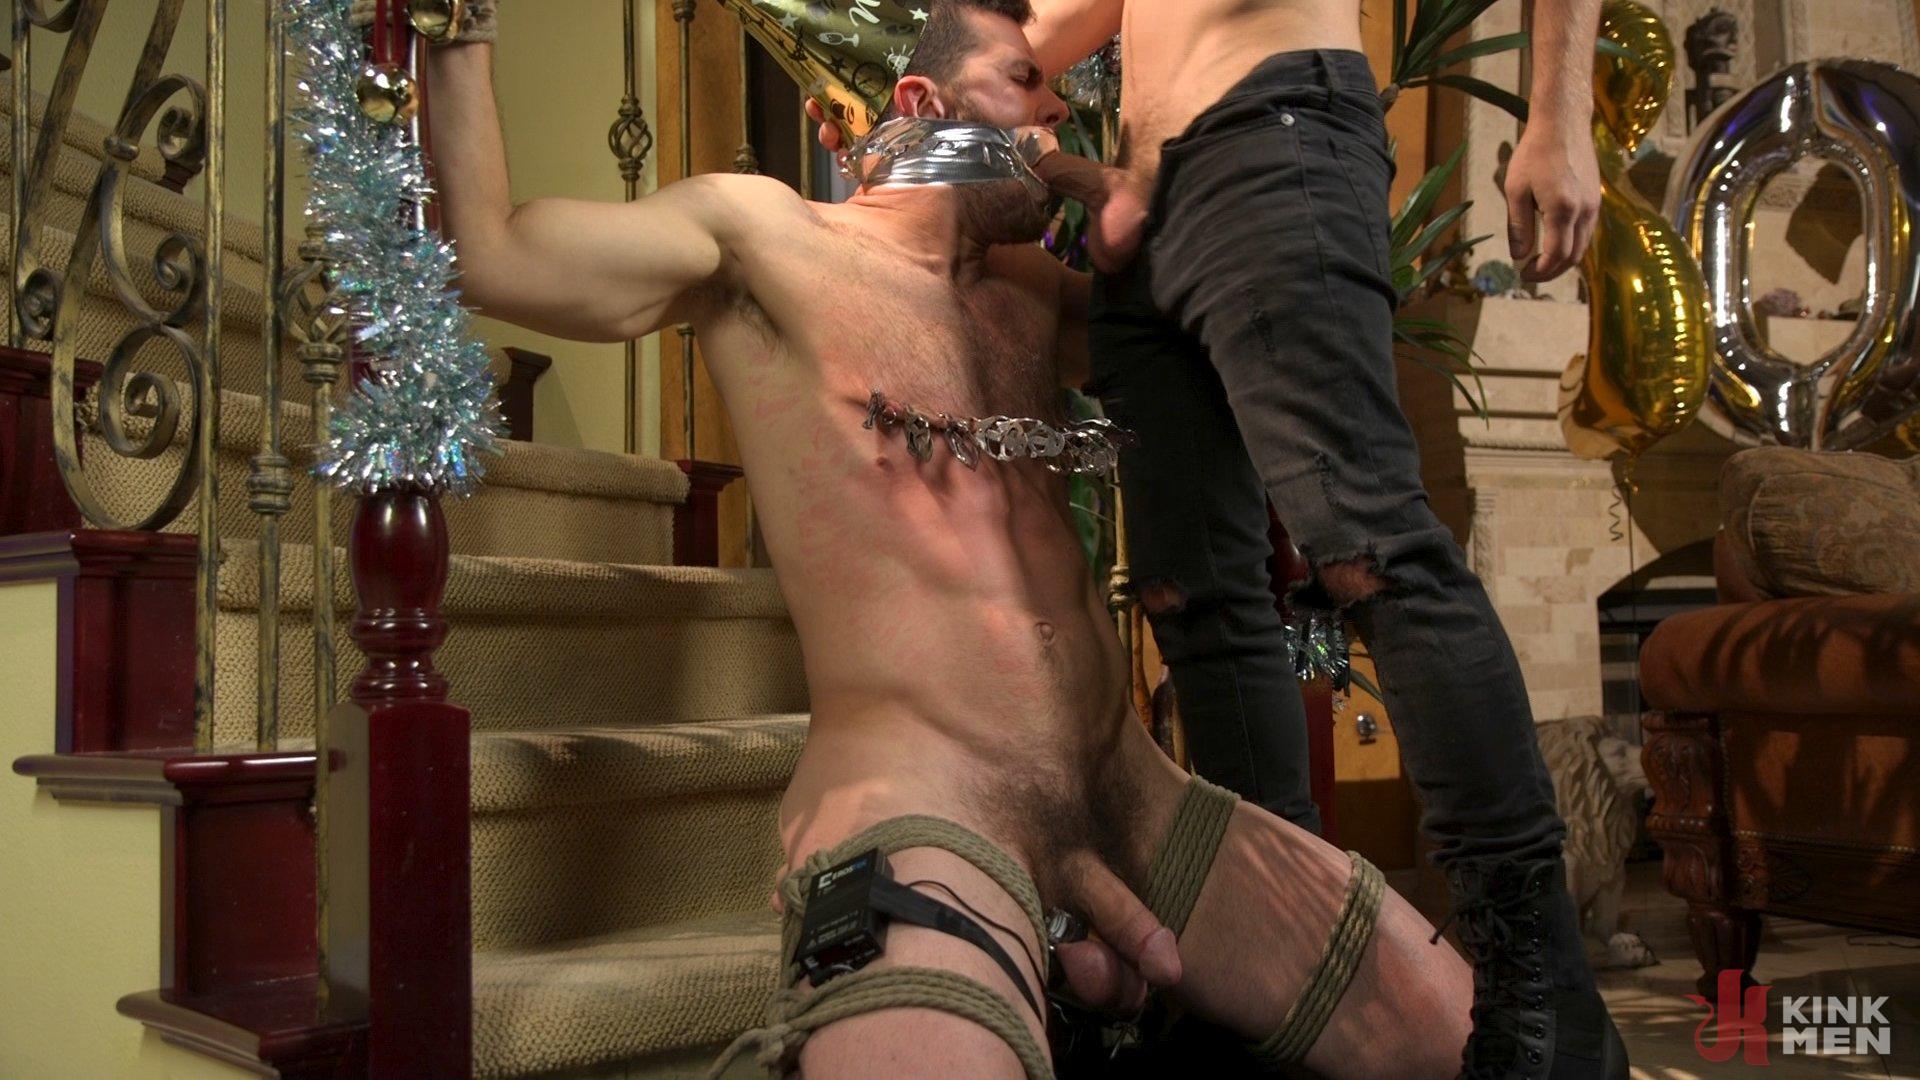 Photo number 14 from Homo Alone Part 2: Pizza Man Michael DelRay Punishes Vander Pulaski shot for Bound Gods on Kink.com. Featuring Michael DelRay and Vander Pulaski in hardcore BDSM & Fetish porn.